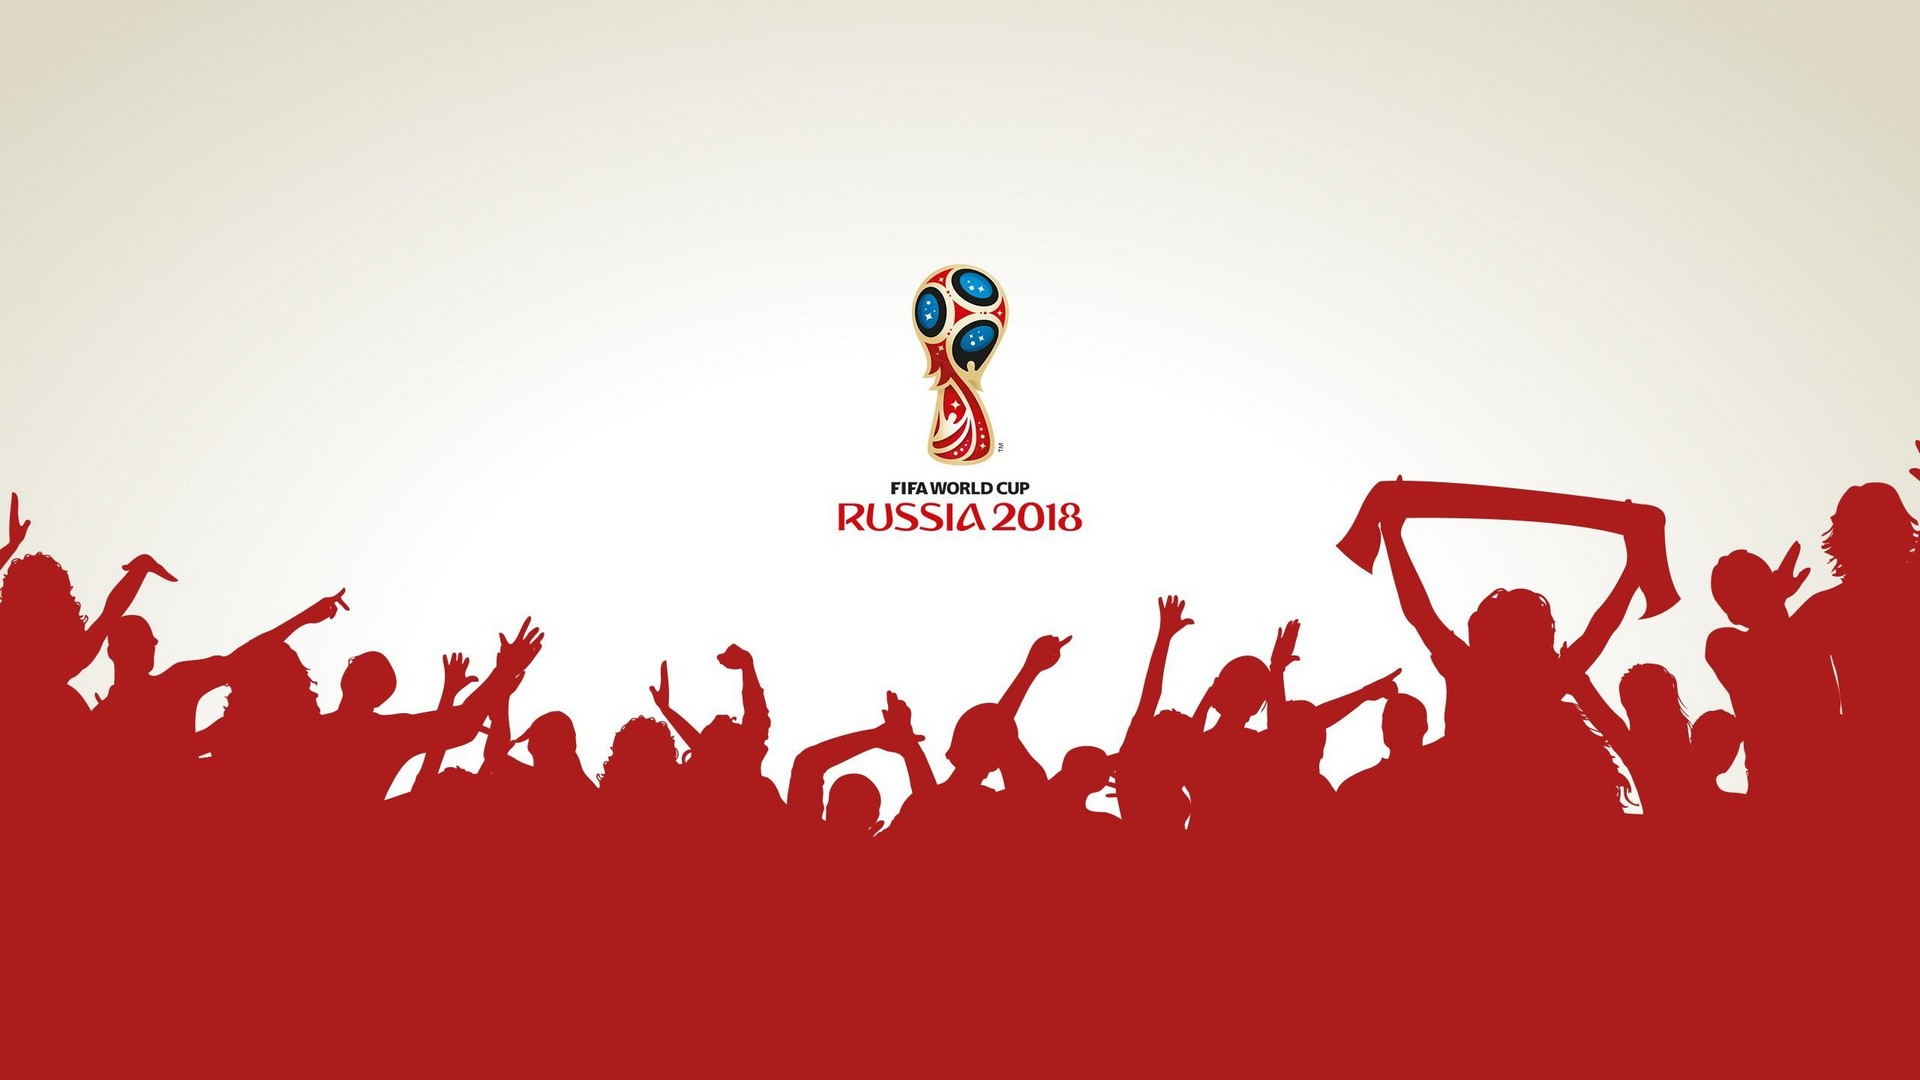 2018 fifa world cup russia free live stream